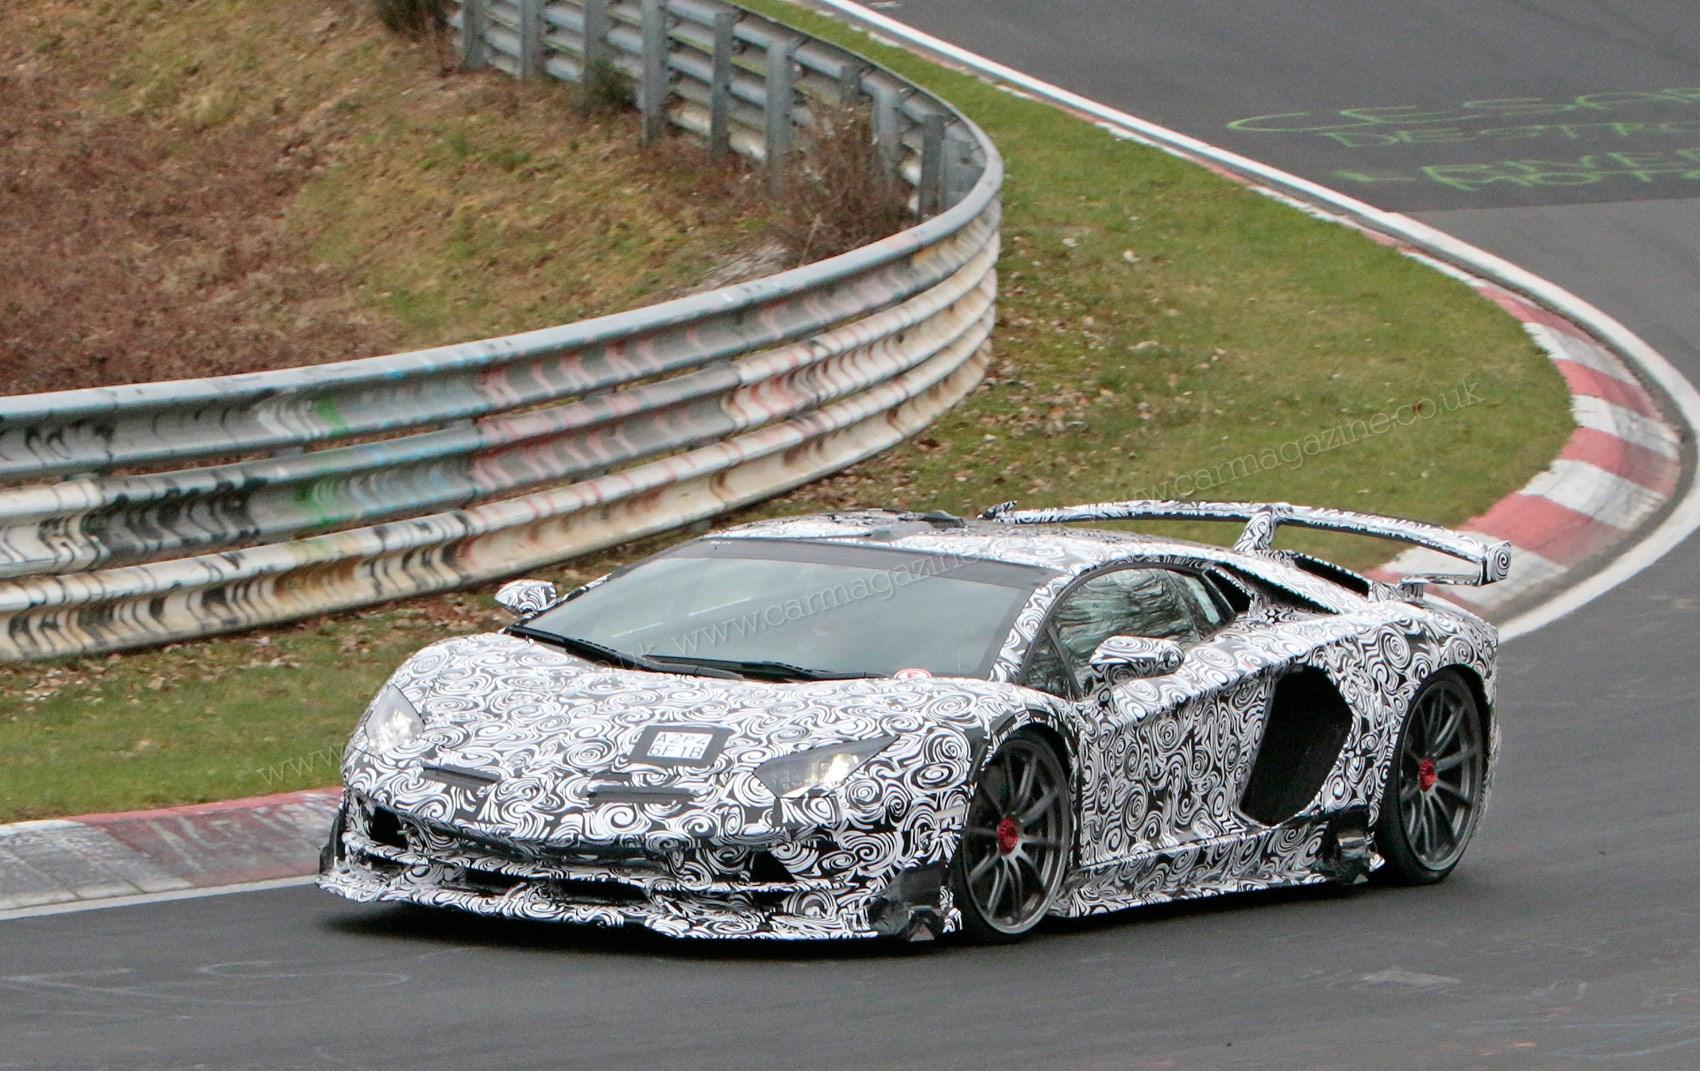 Lamborghini Aventador Sv Jota 2019 Coupe And Roadster Spy Photos Specs On Sale Date Car Magazine